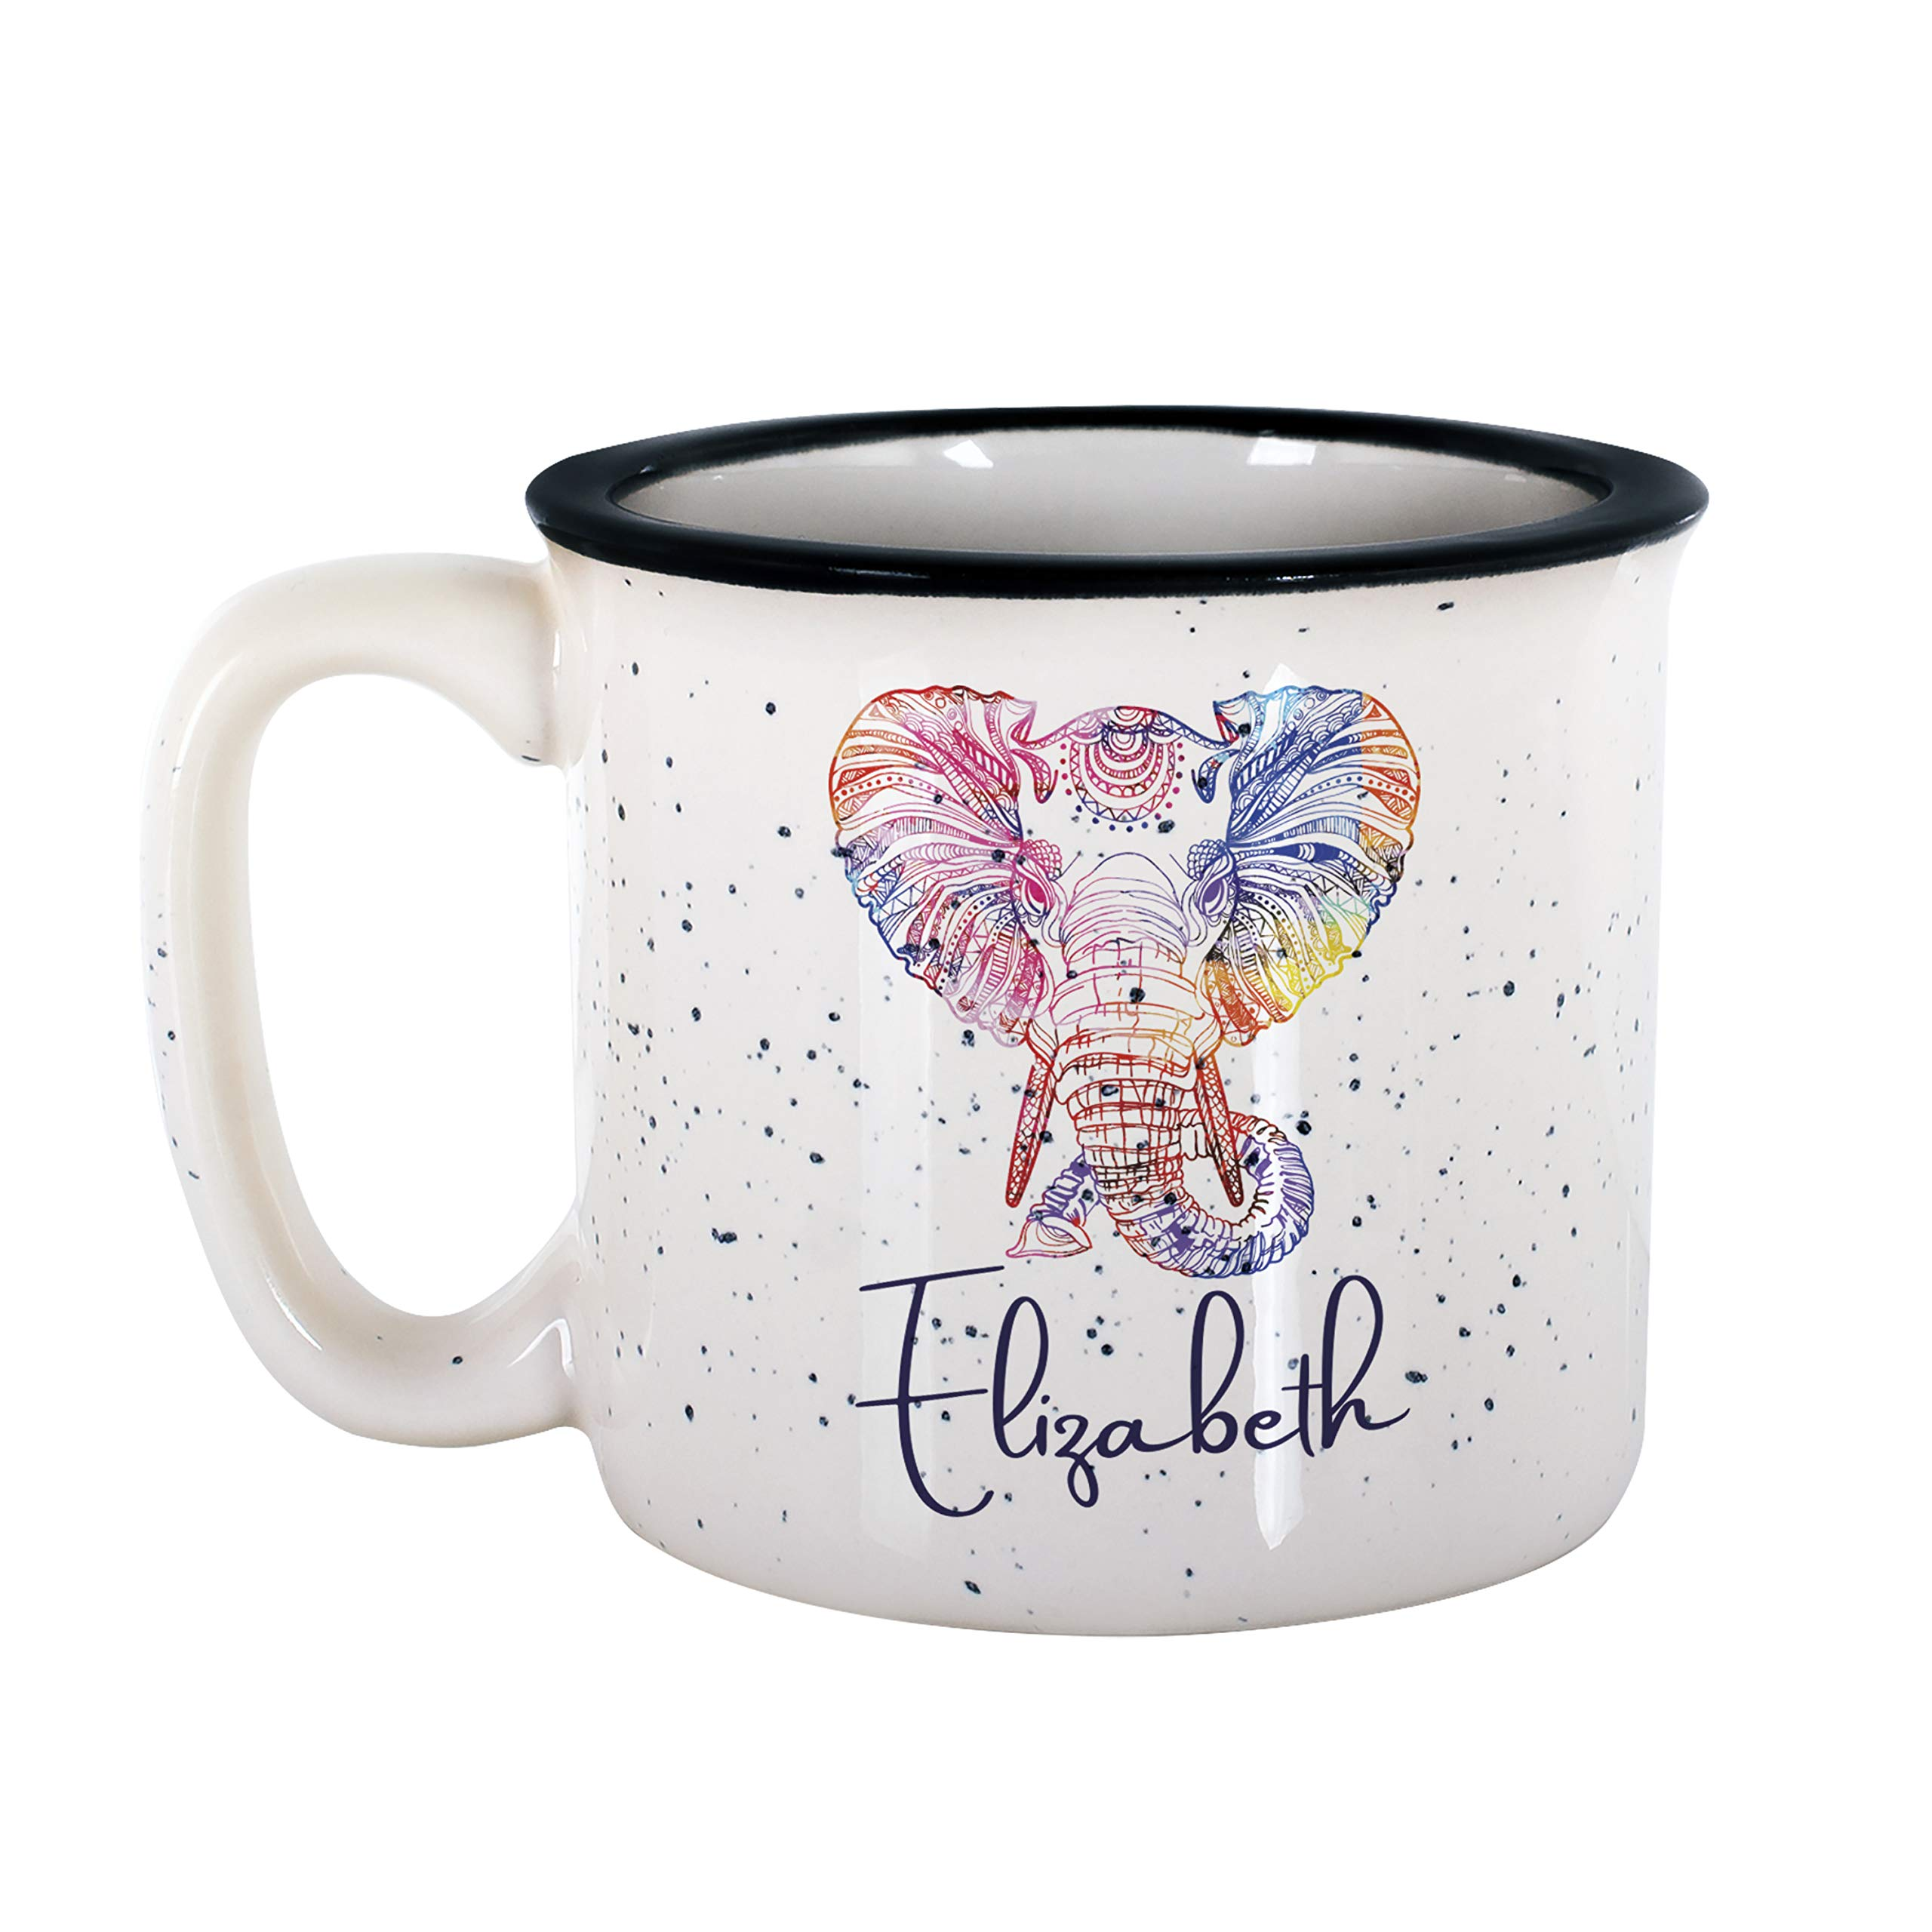 Personalized Gifts Colorful Elephant Coffee Mug - 16oz Camp Style Ceramic Mug -Birthday Gifts, Christmas Gifts, Mother's Day Gifts, Father's Day Gifts, Funny Mug for Kids